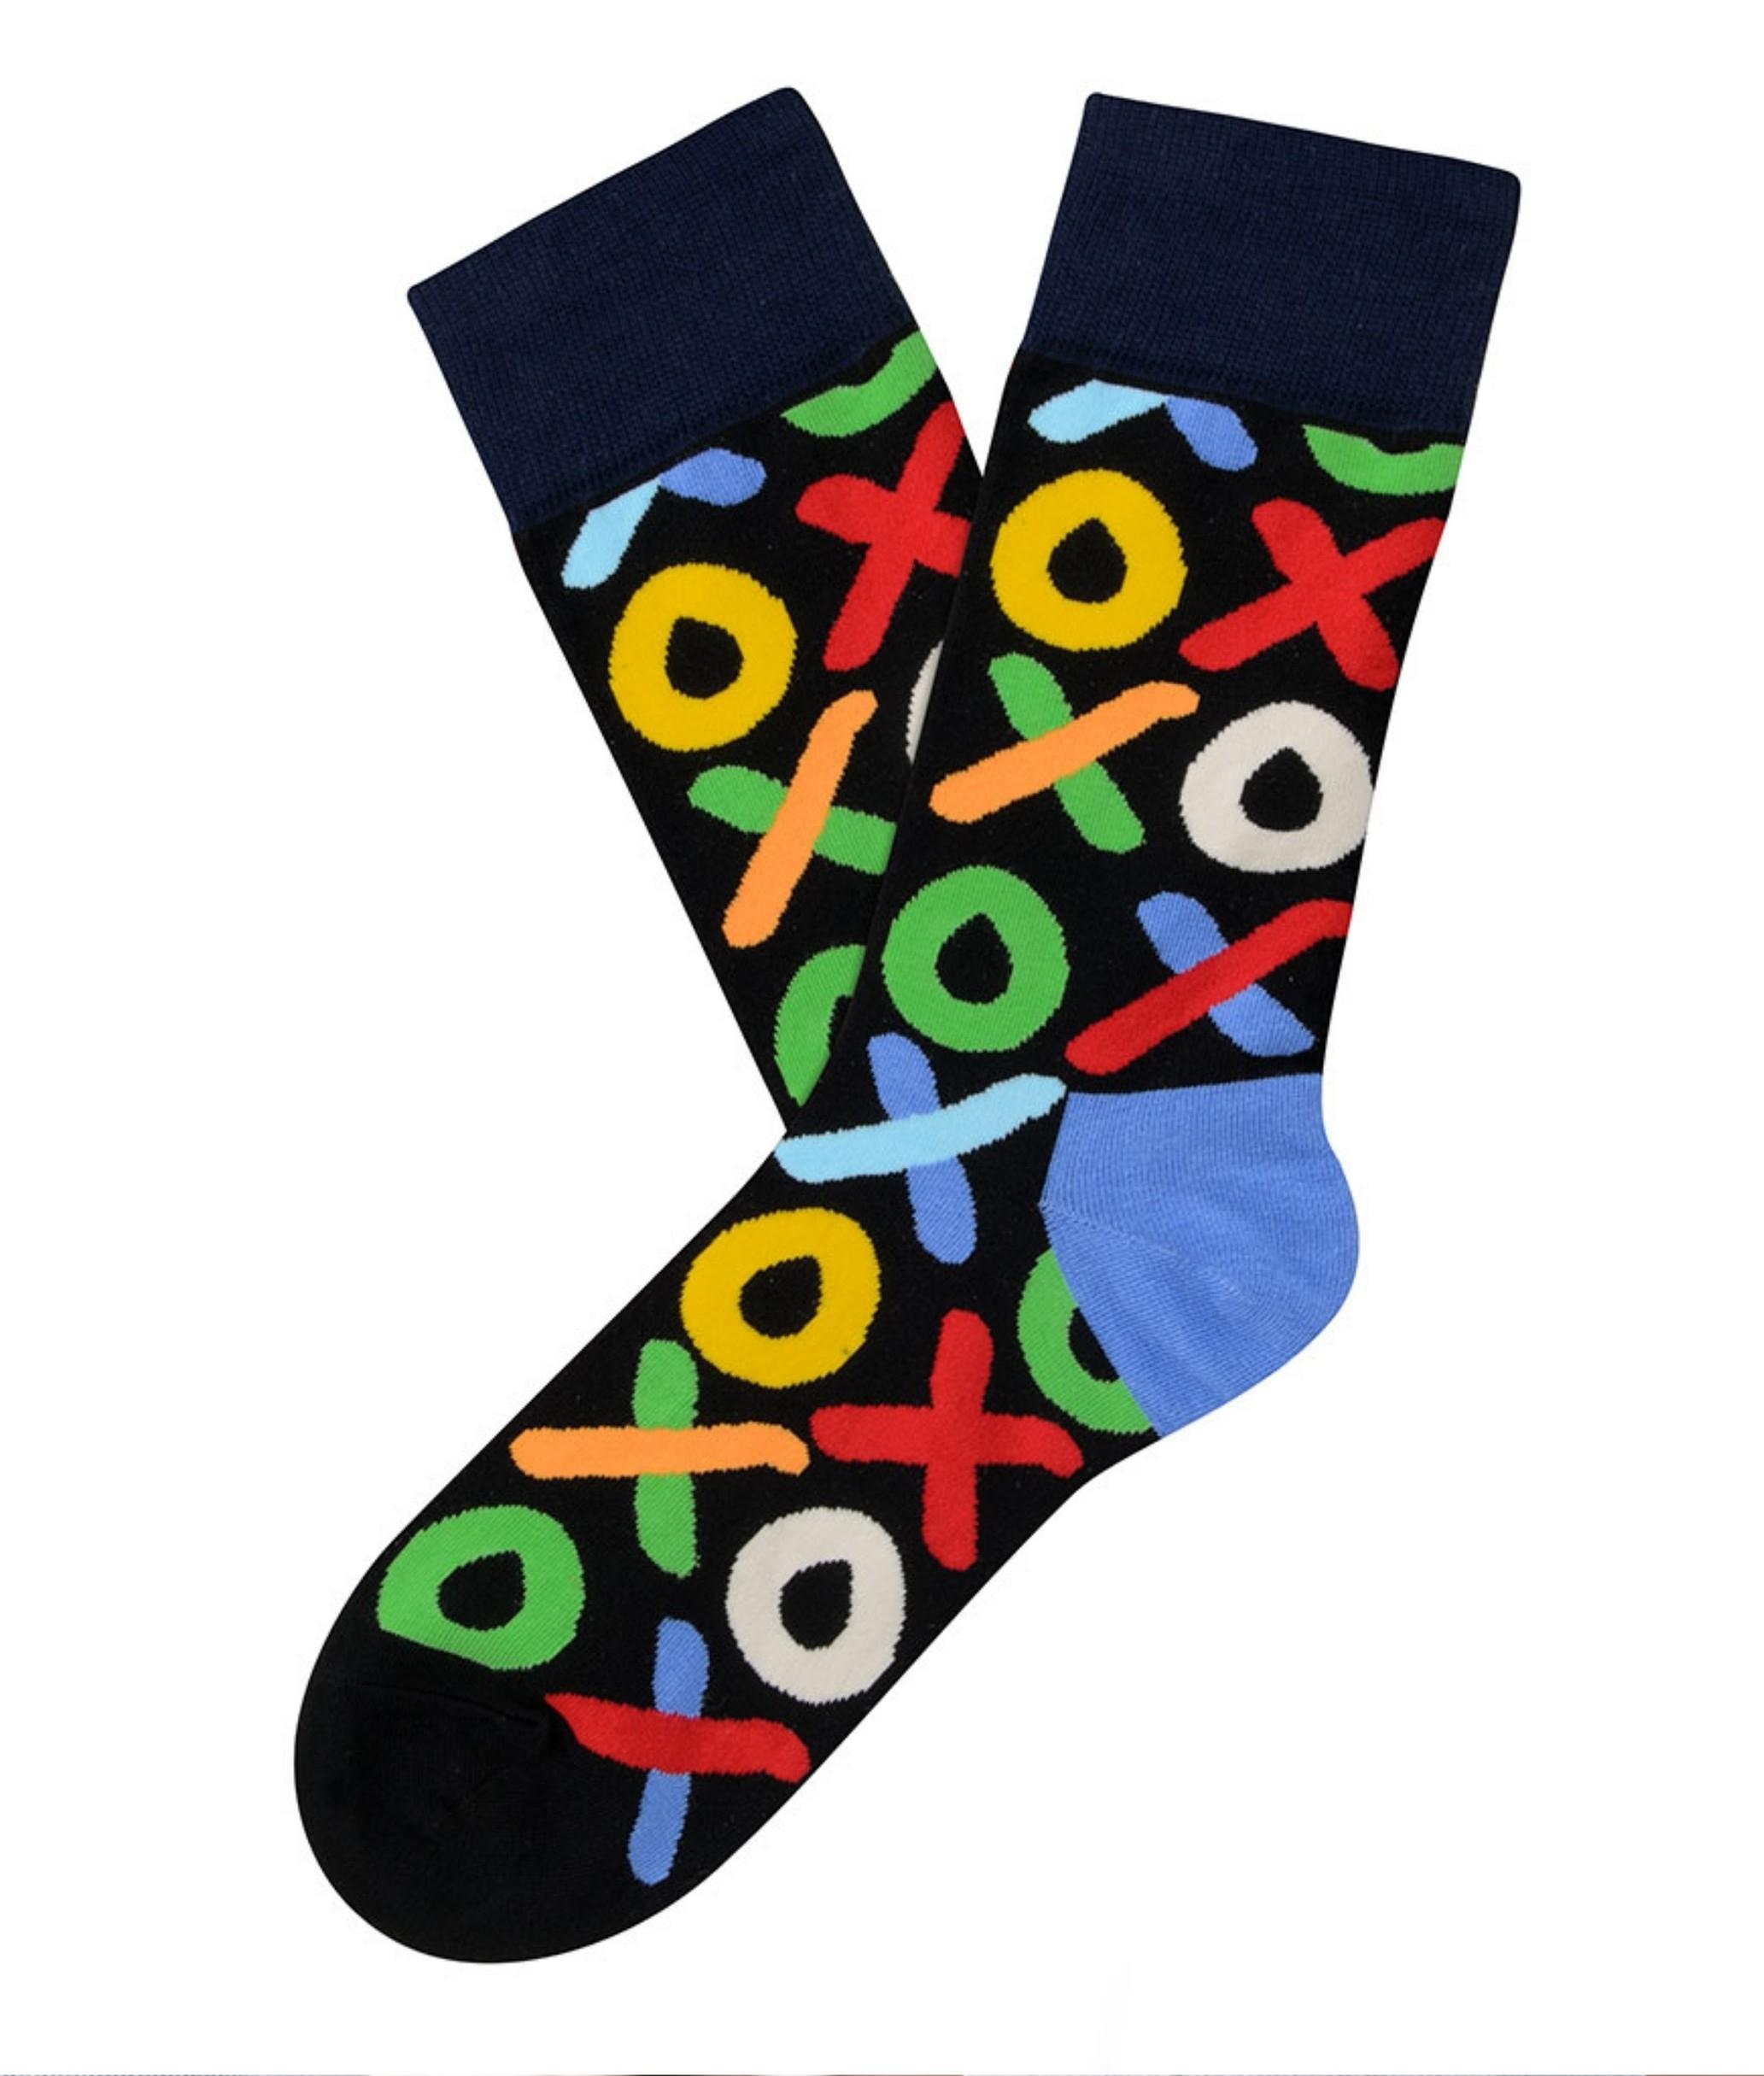 Sock Alto Kylie - XO-XO Negro